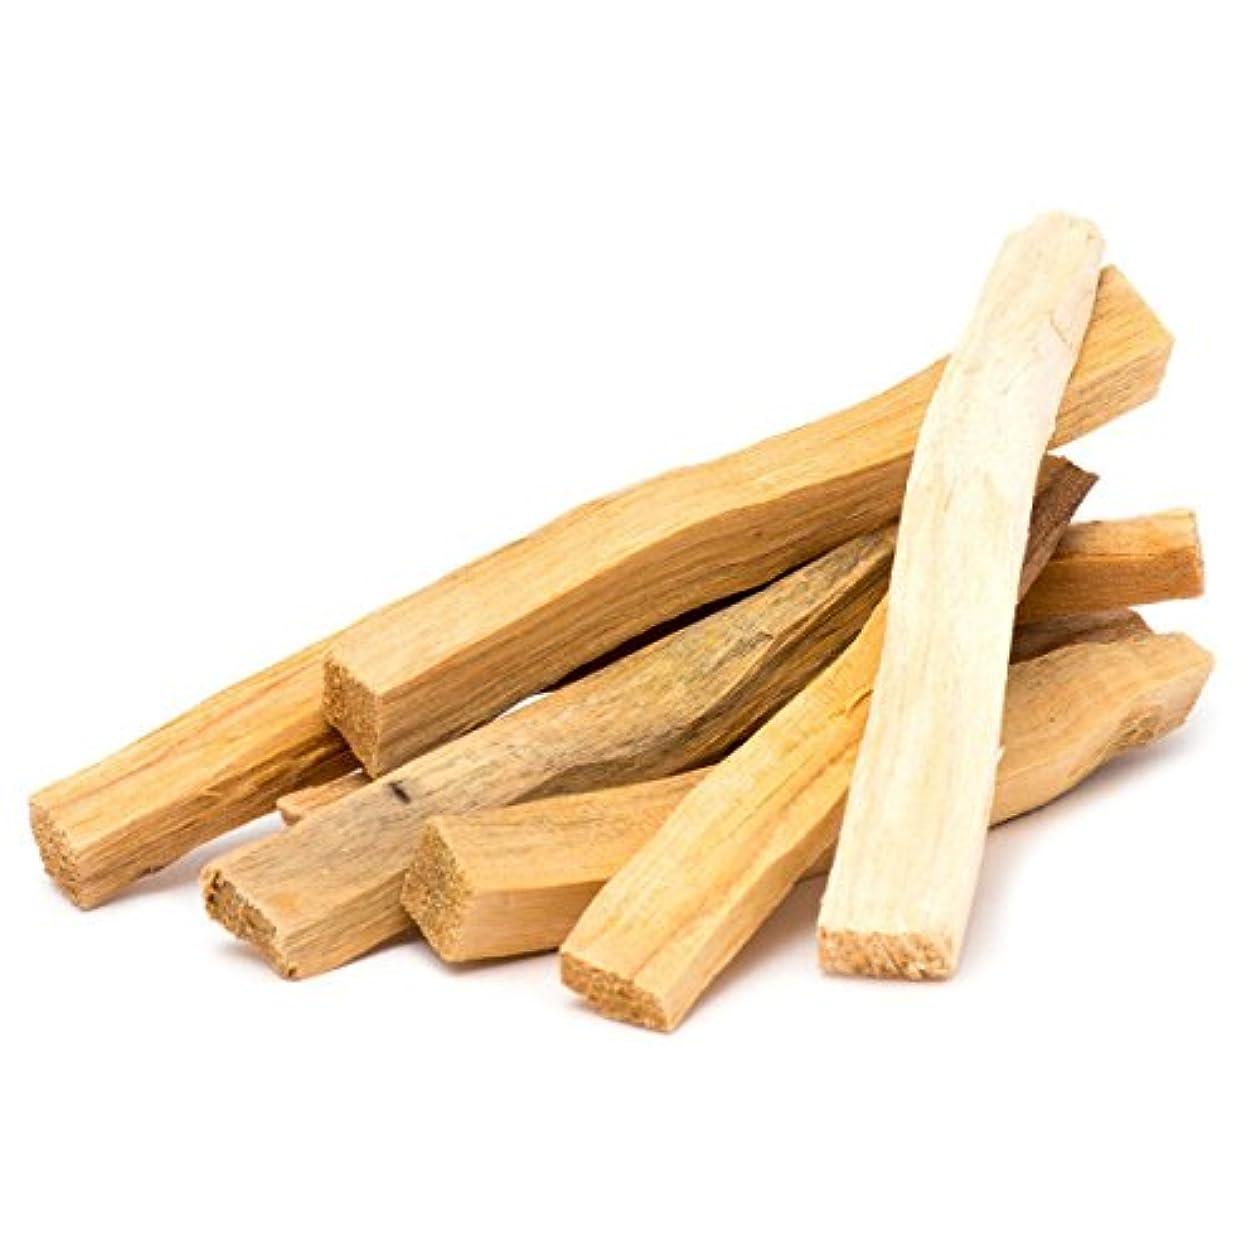 思想天井妖精Palo Santo – 有機 – 6 Sticks – By Earthwise Aromatics